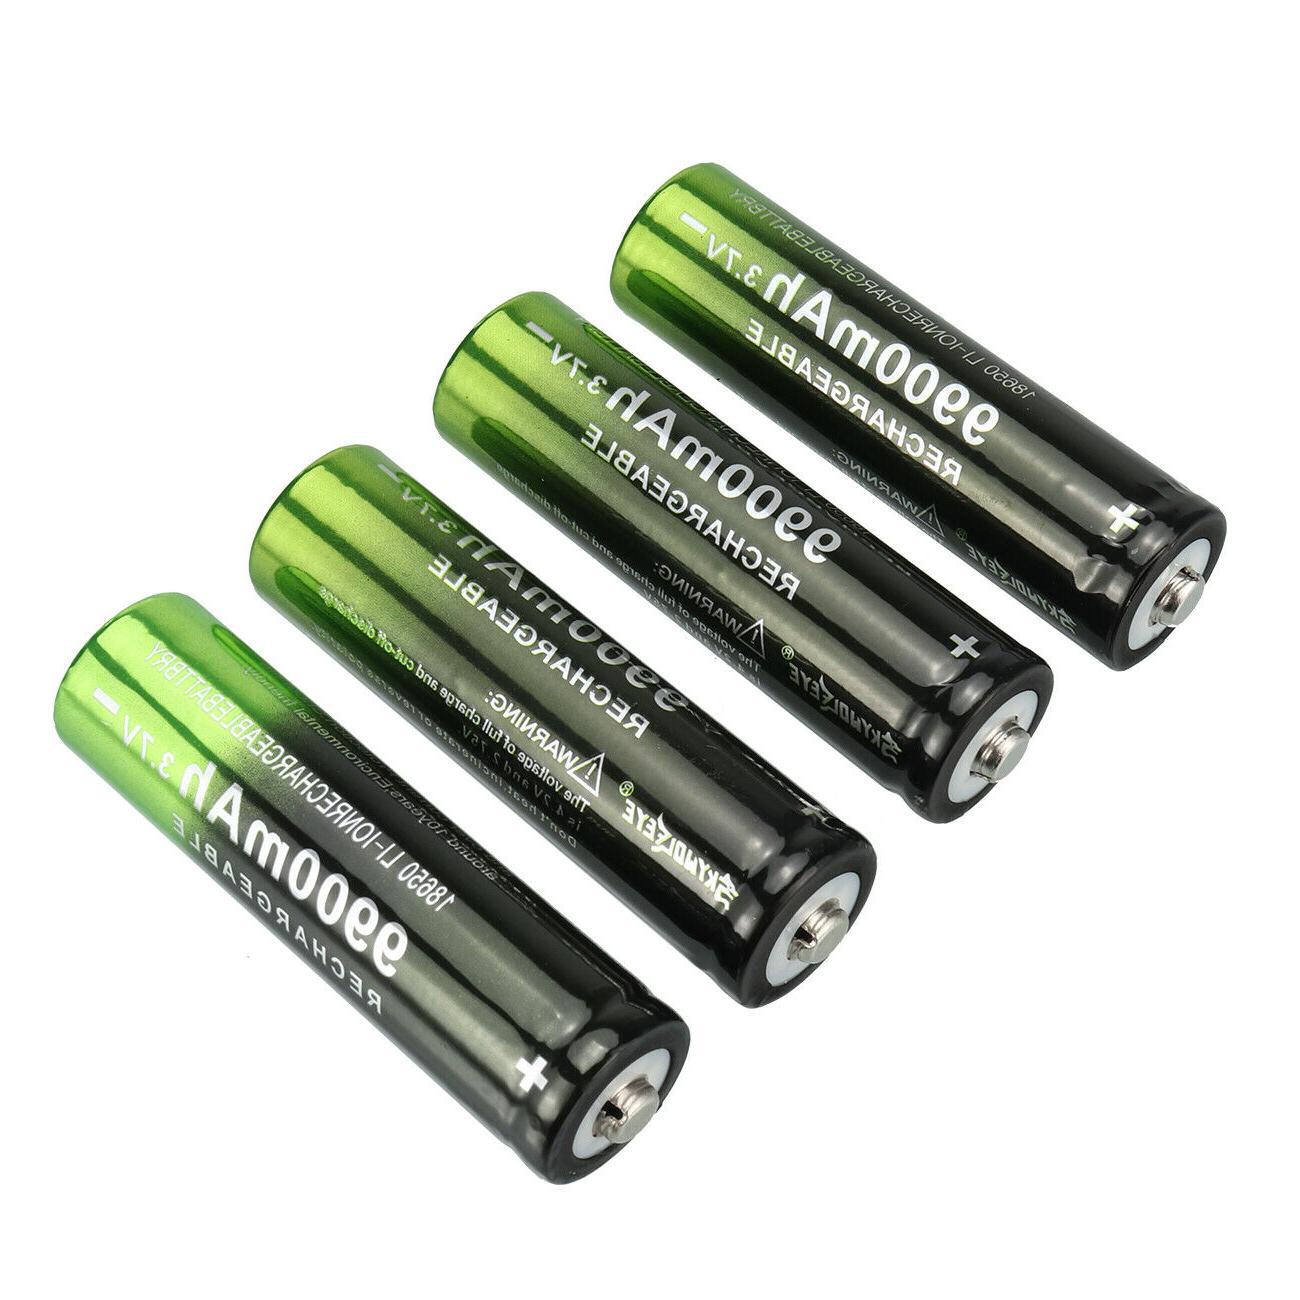 10X Battery Li-Ion Batteries for LED Flashlight